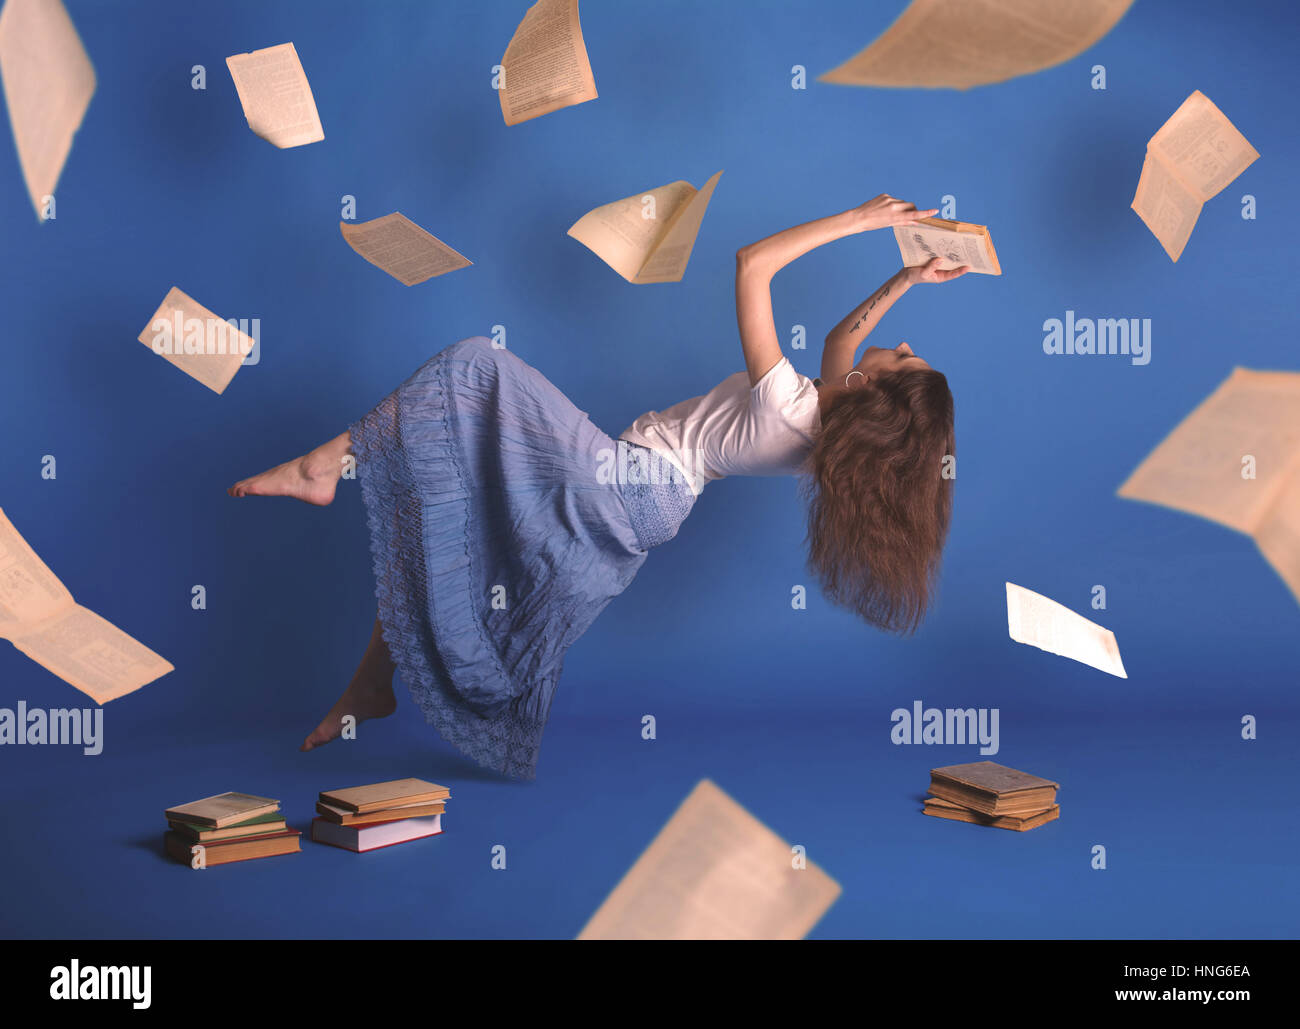 surreal creative design levitation flying woman levity people